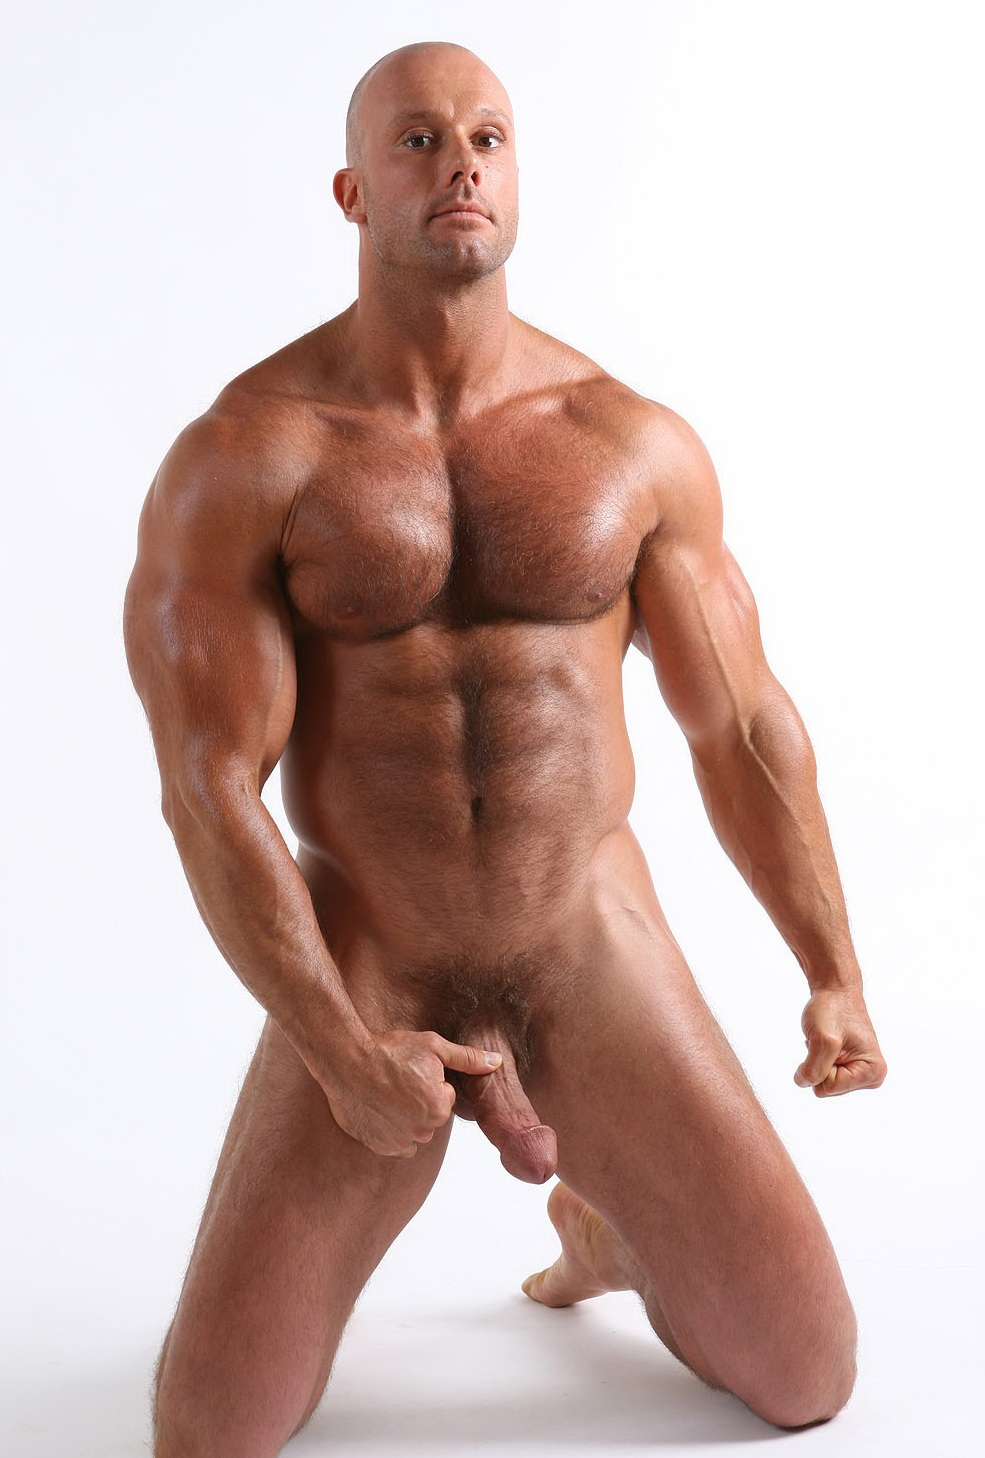 gay male wrangler jeans bulge